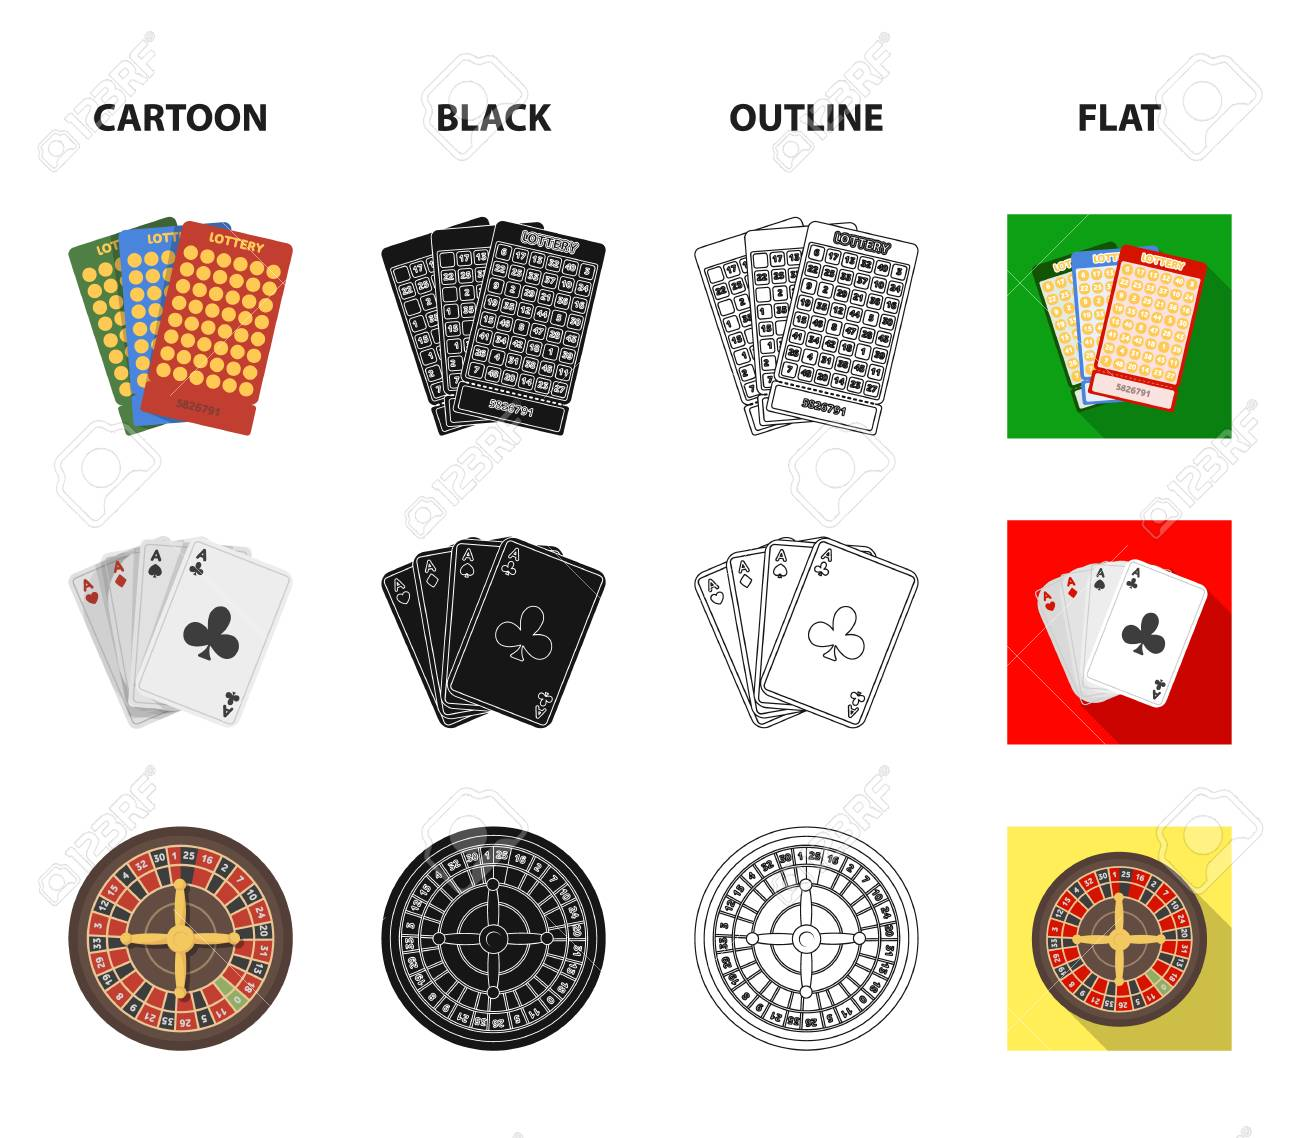 bingo black casino jacl poker free